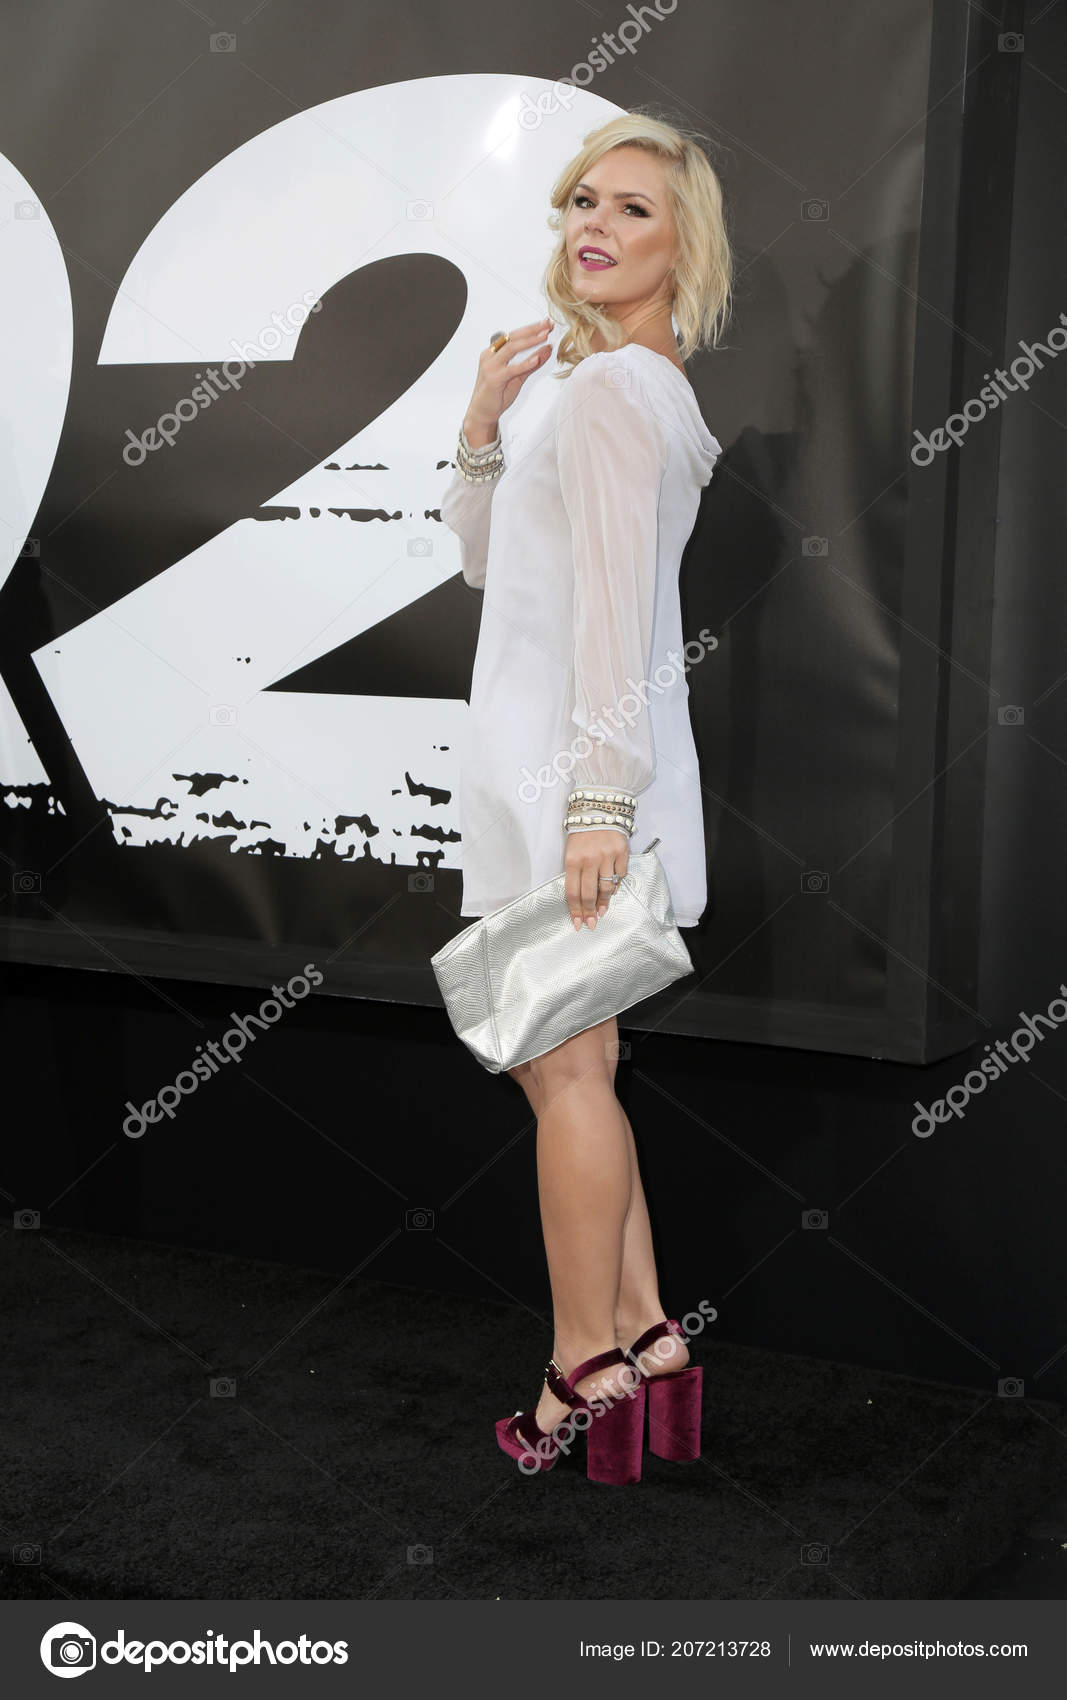 Samantha Barks (born 1990)